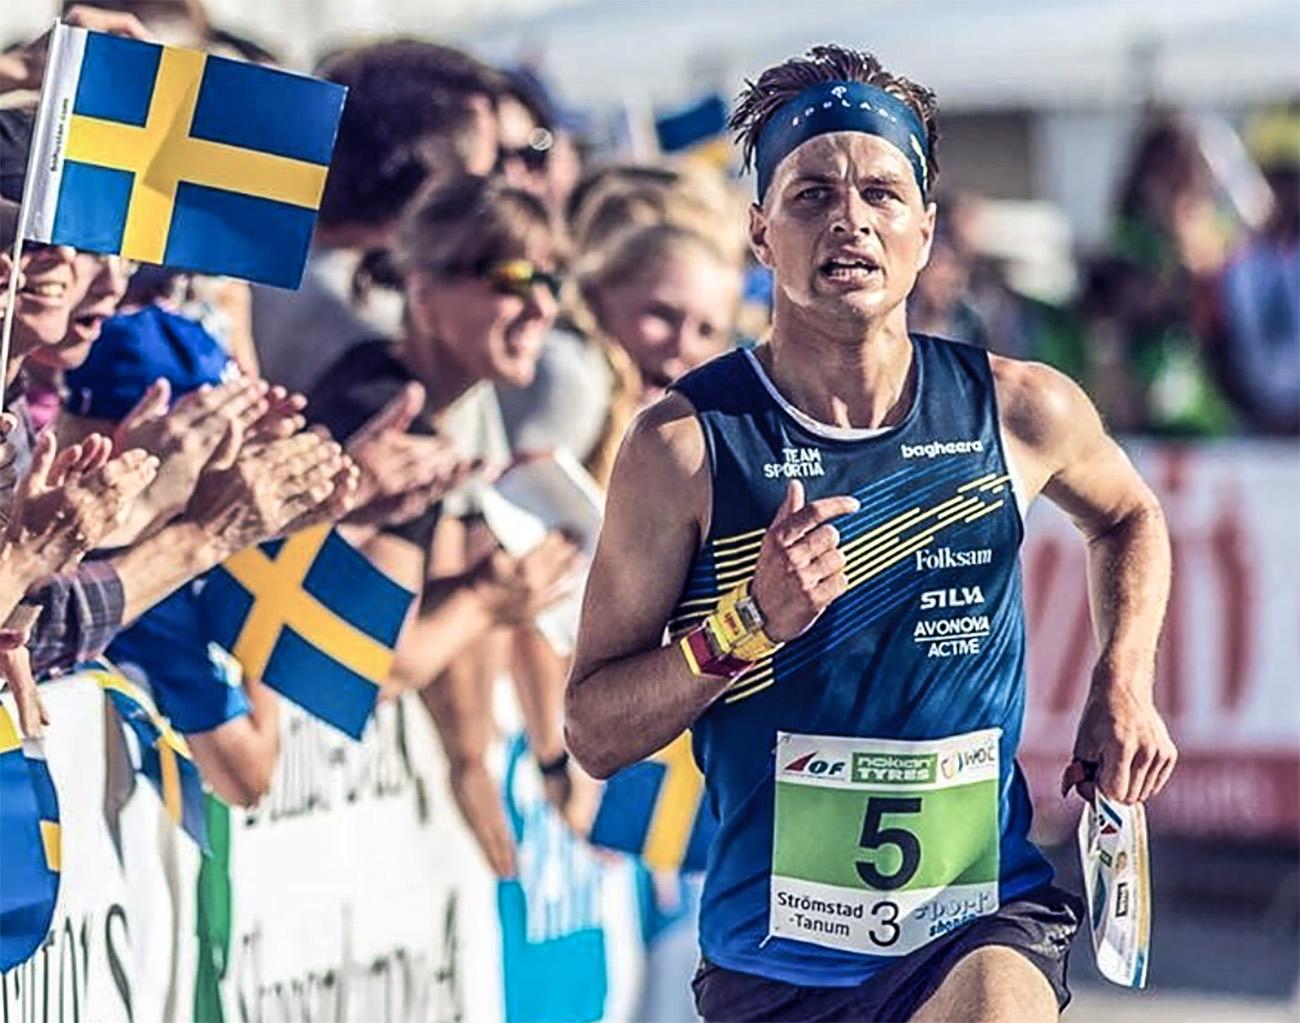 Bli en löpare med Jonas Leandersson